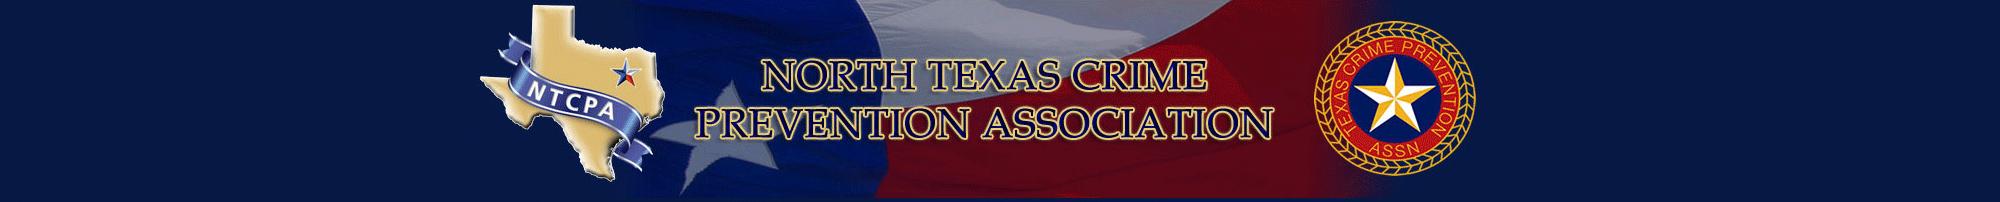 North Texas Crime Prevention Association